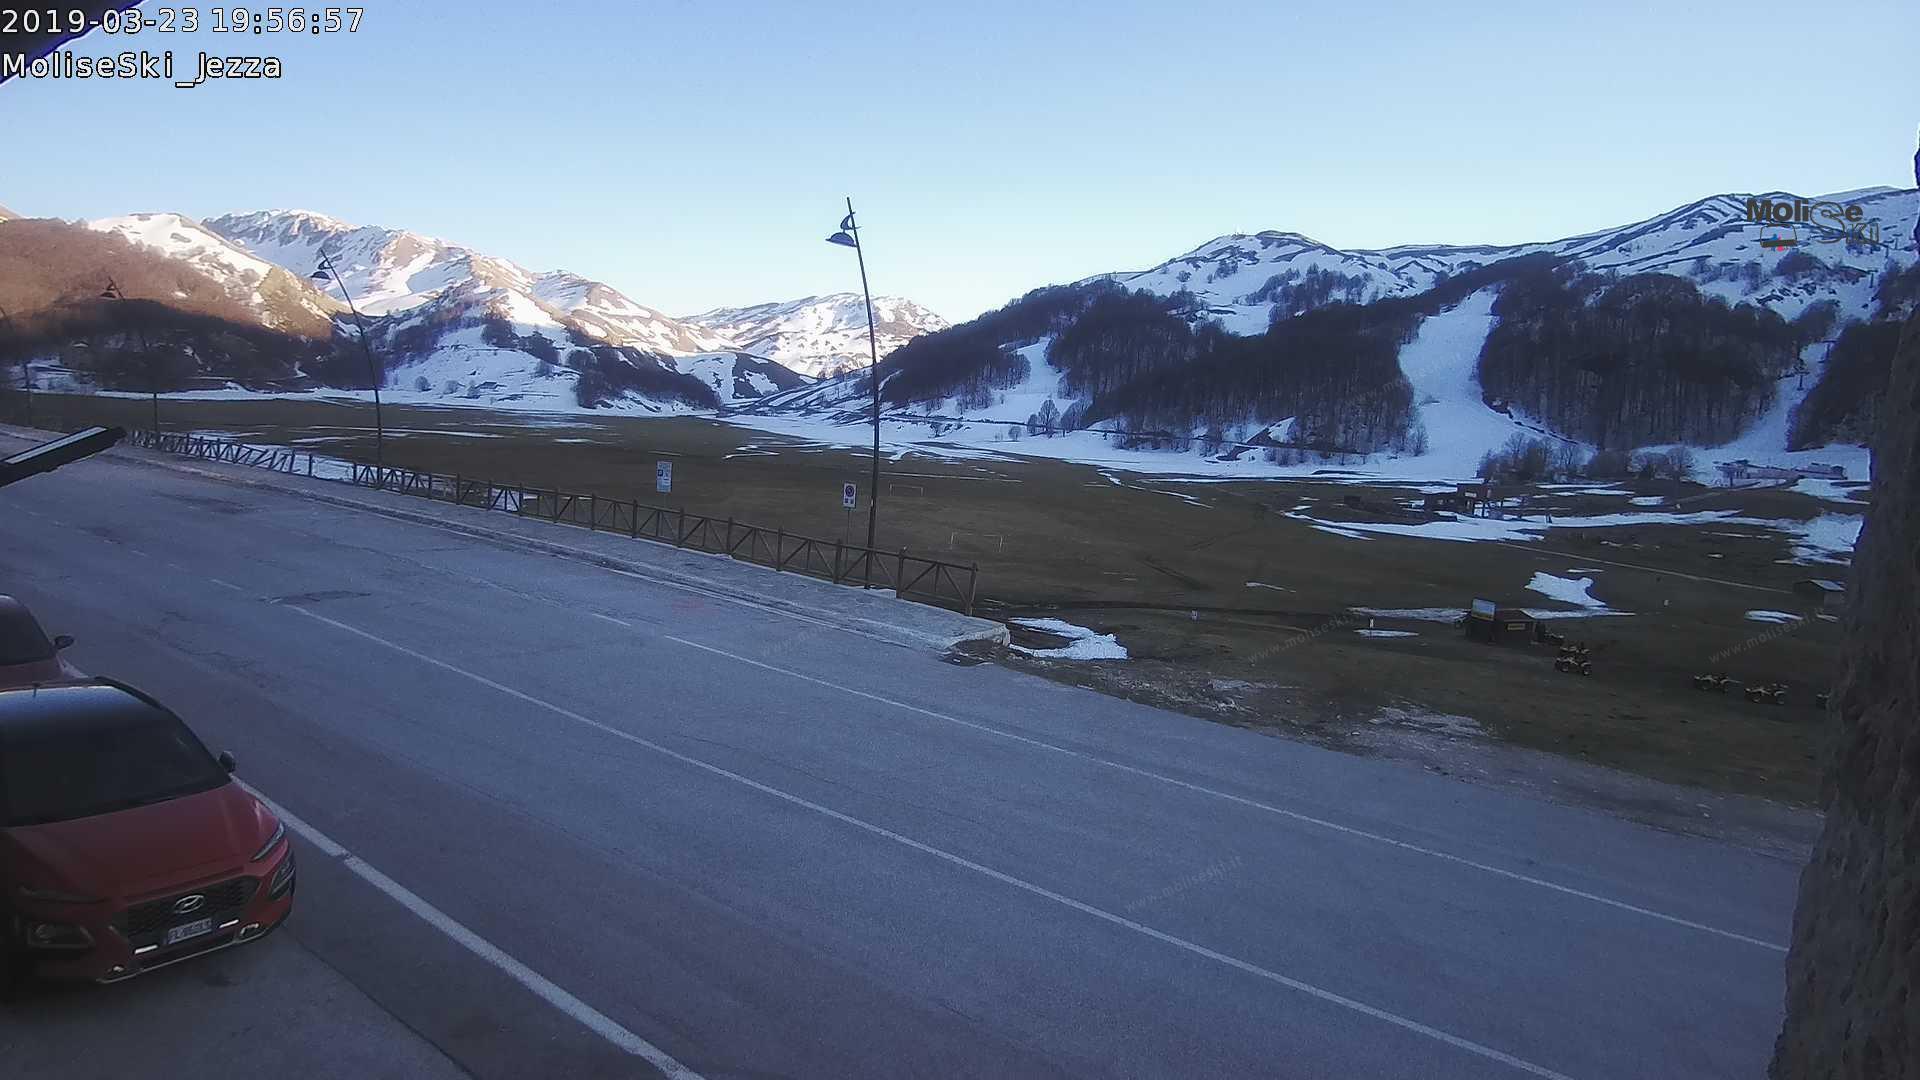 Webcam Montagna del Matese